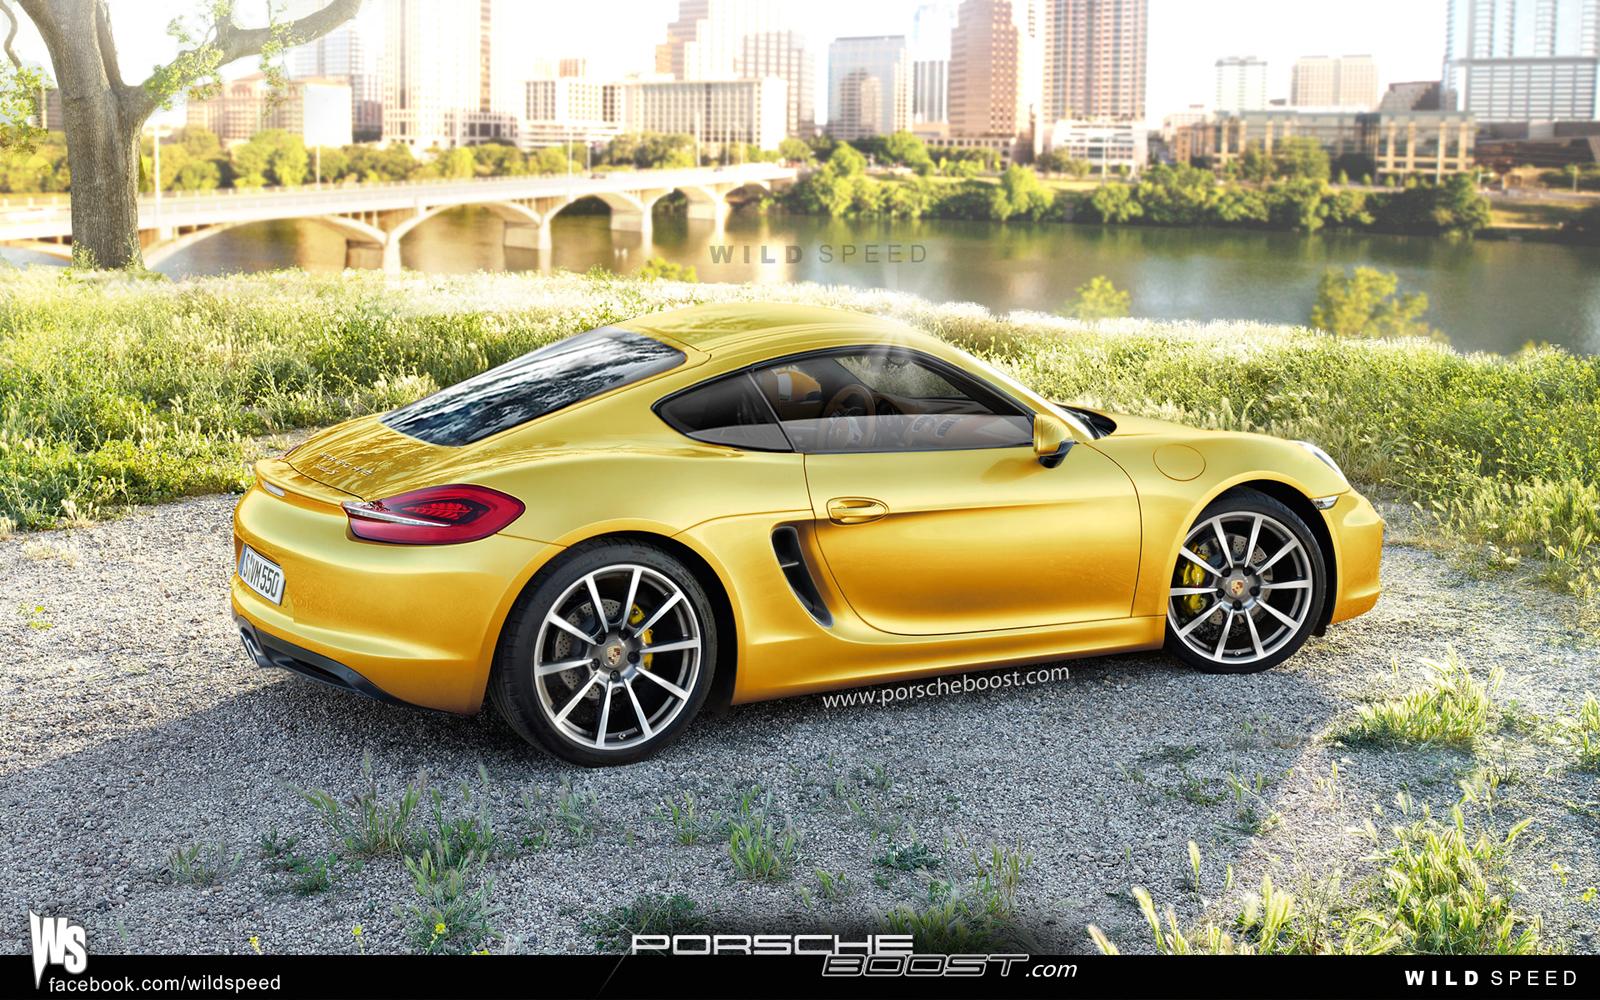 cayman-rear-yellow-2013